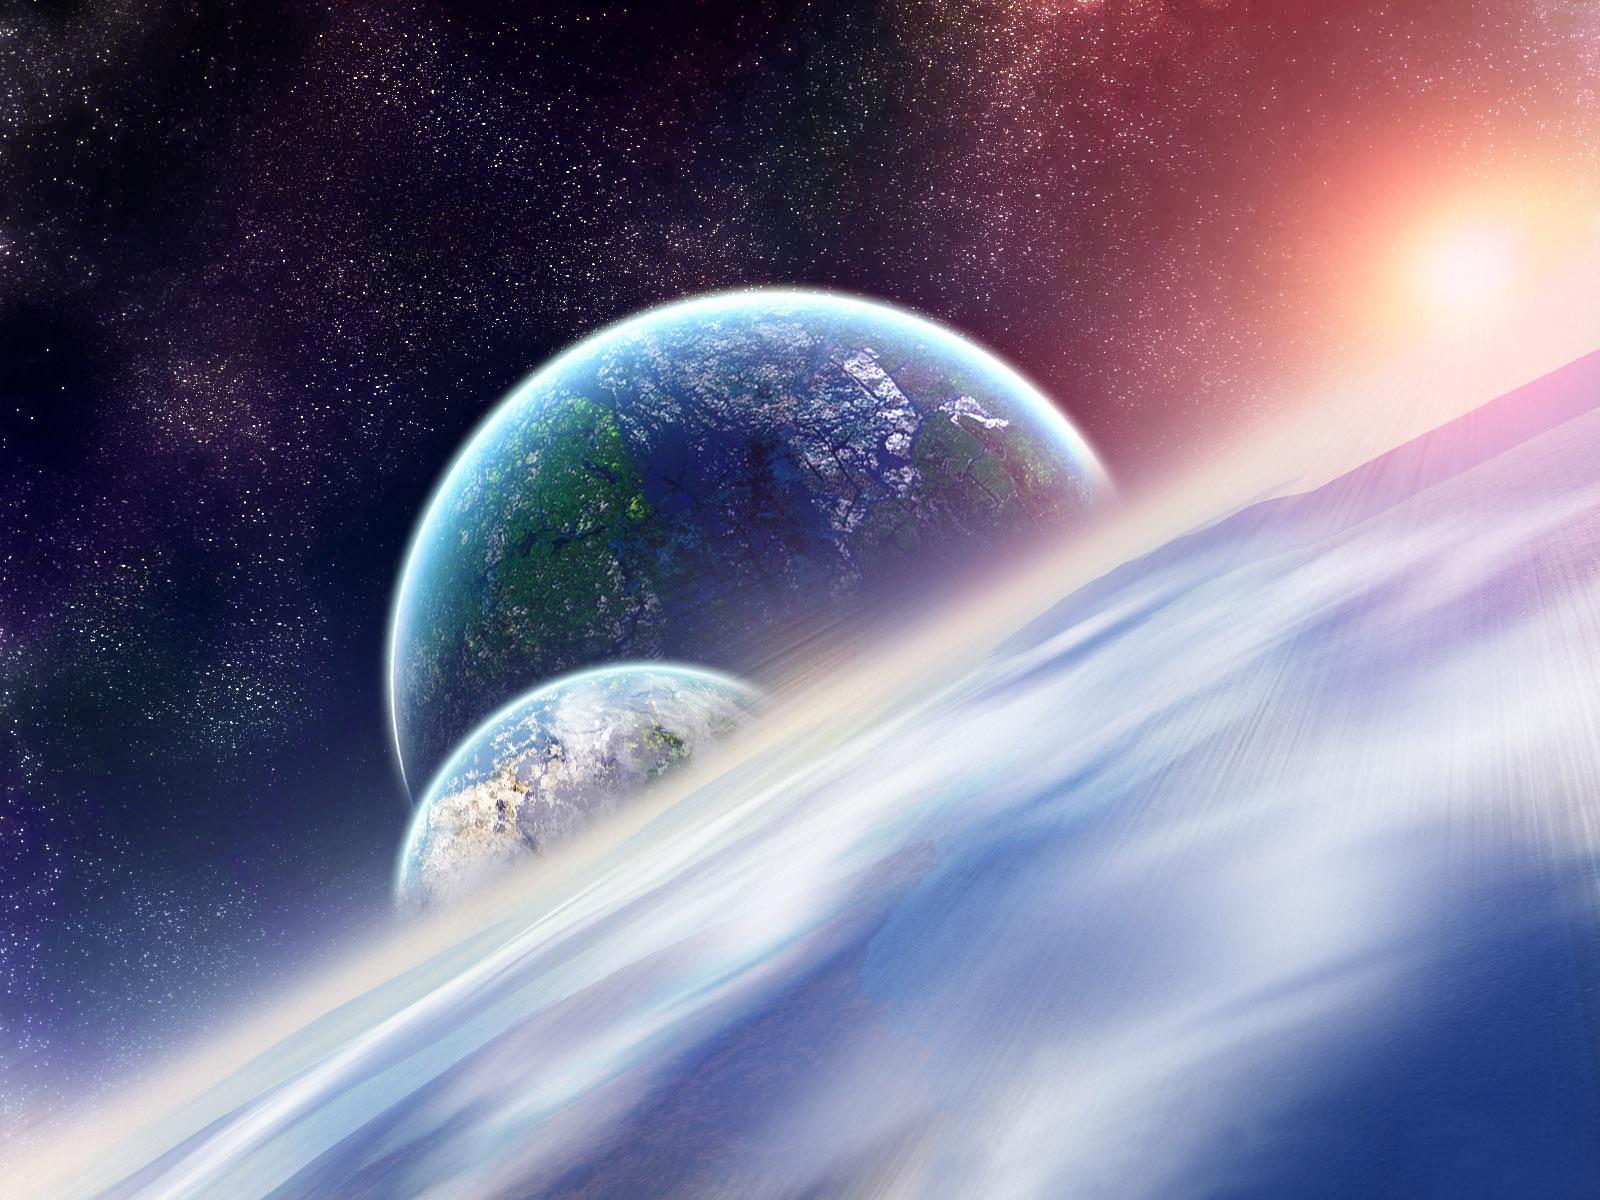 universe the beautiful Star Wallpaper 40   1600x1200 Wallpaper 1600x1200